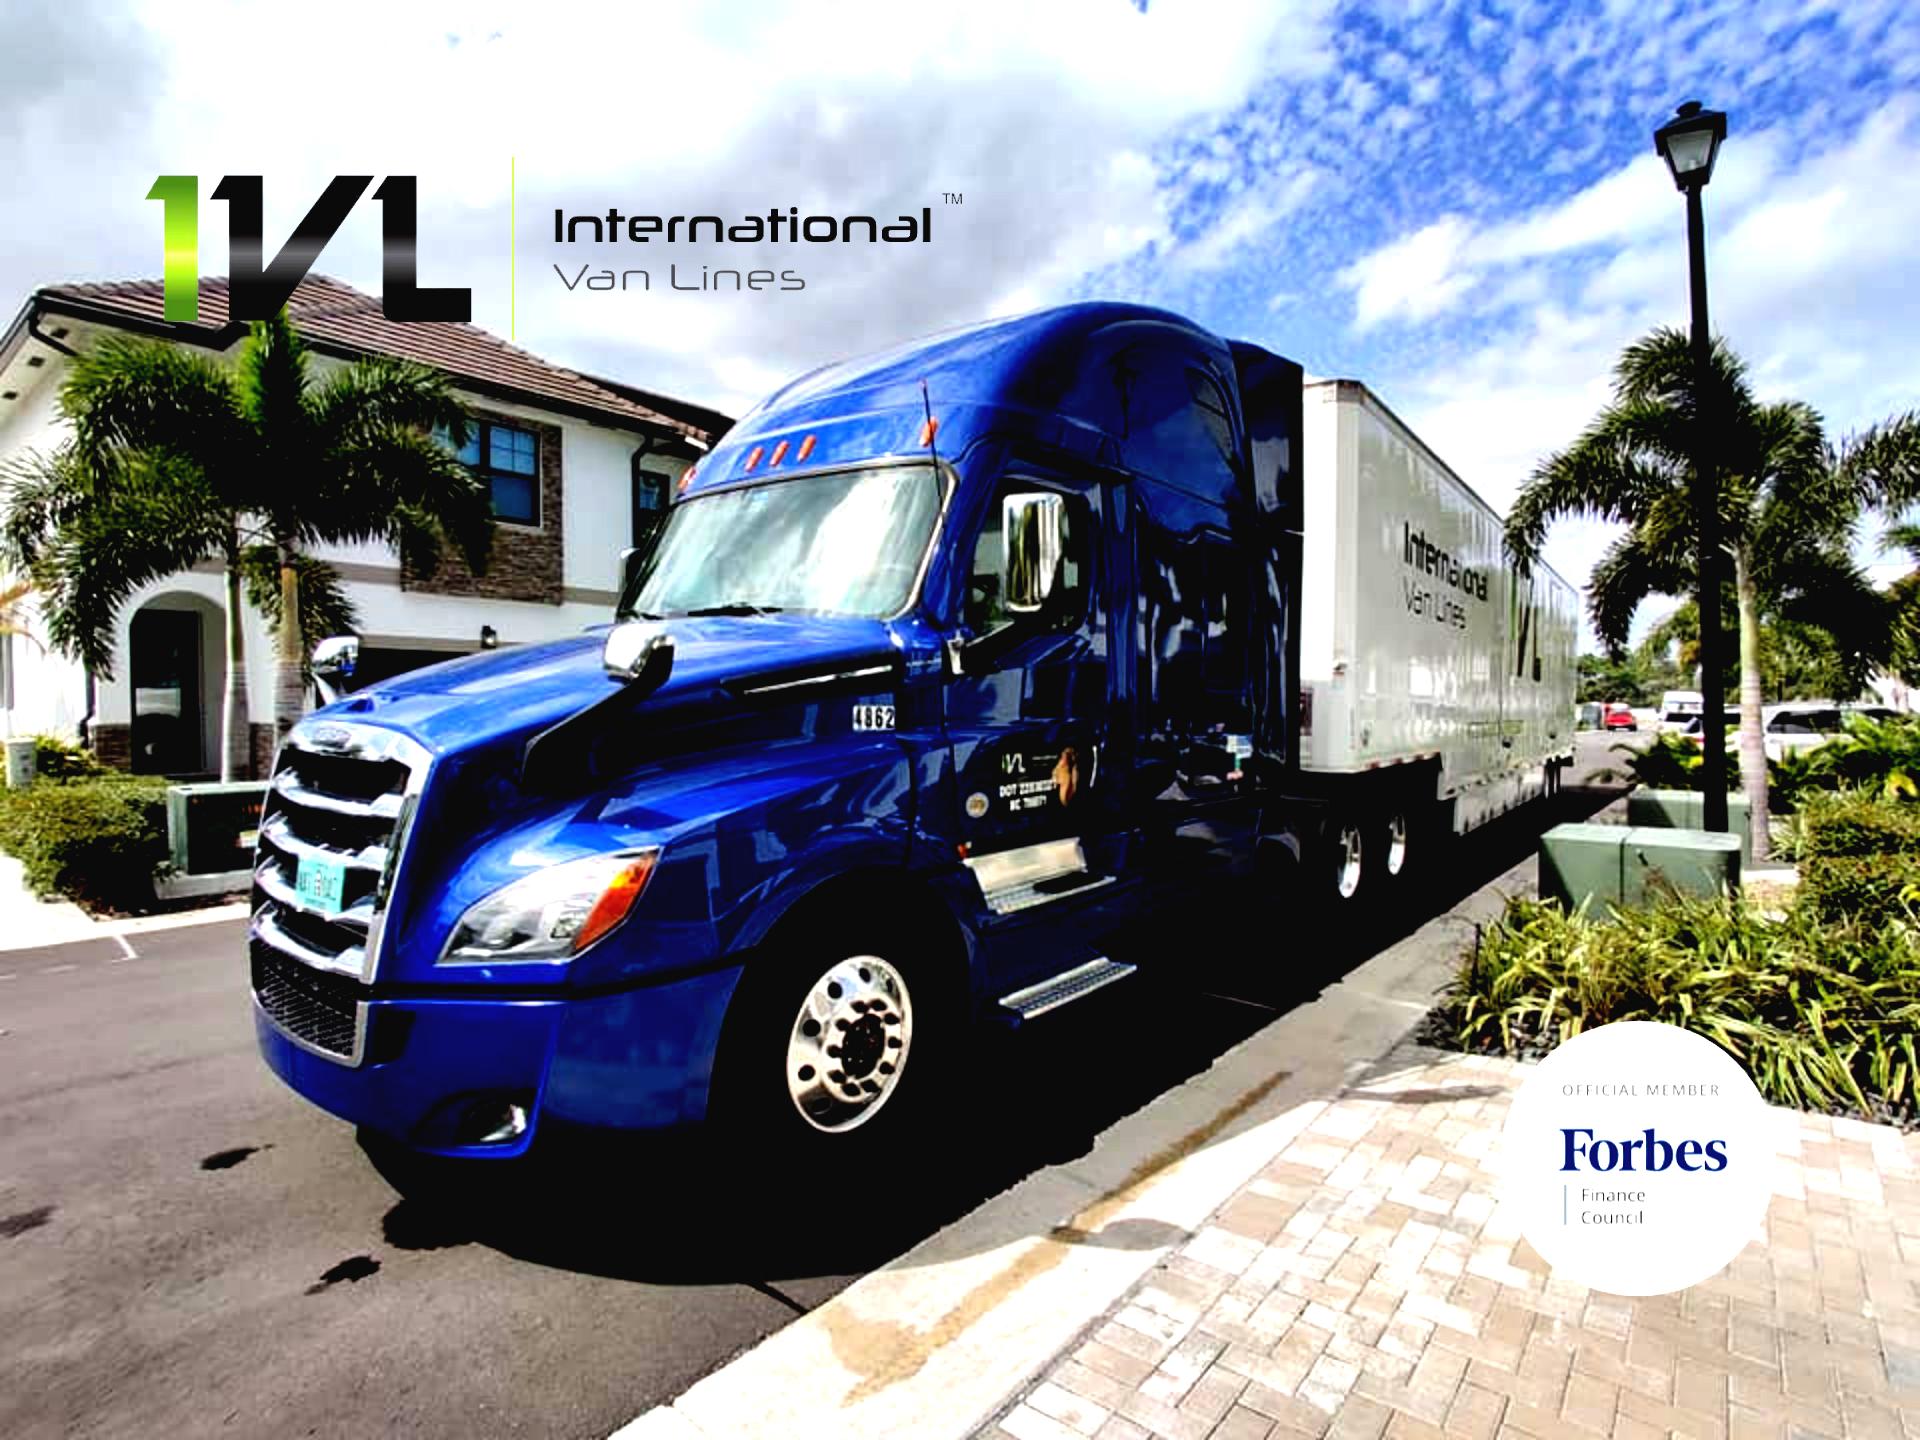 Long-distance moving company International Van Lines